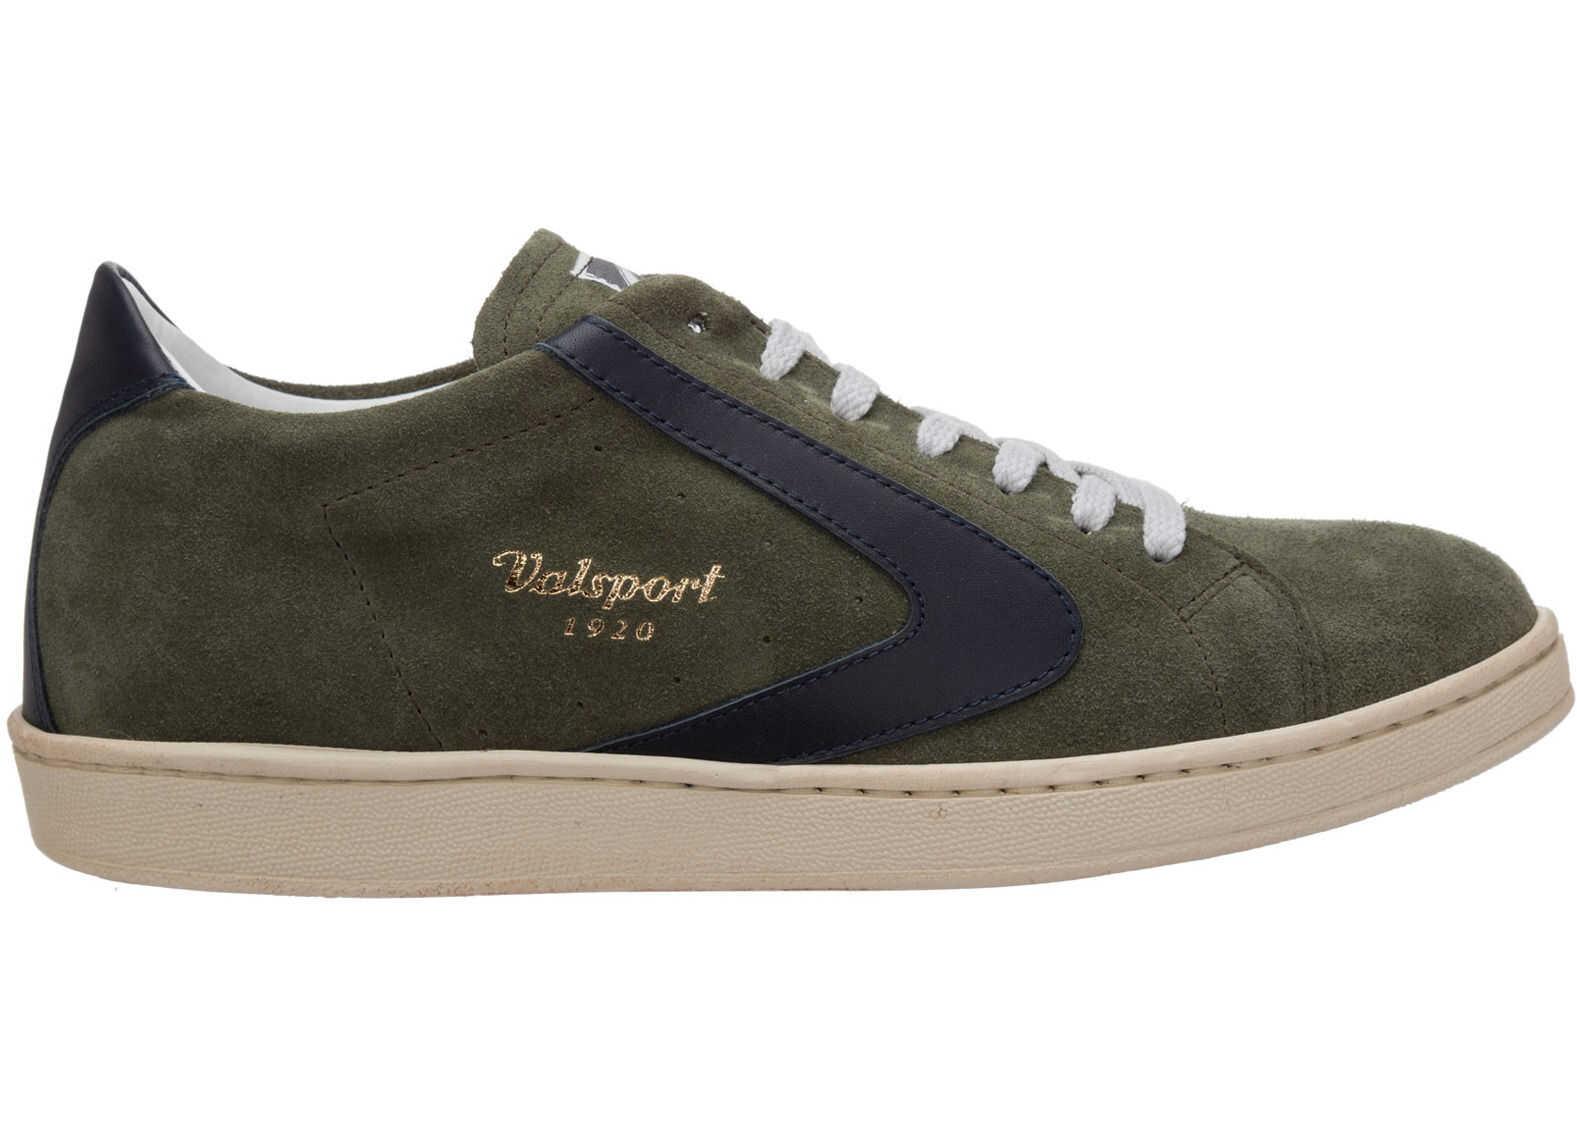 Valsport 1920 Sneakers Tournament VTSL001M55301 Green imagine b-mall.ro